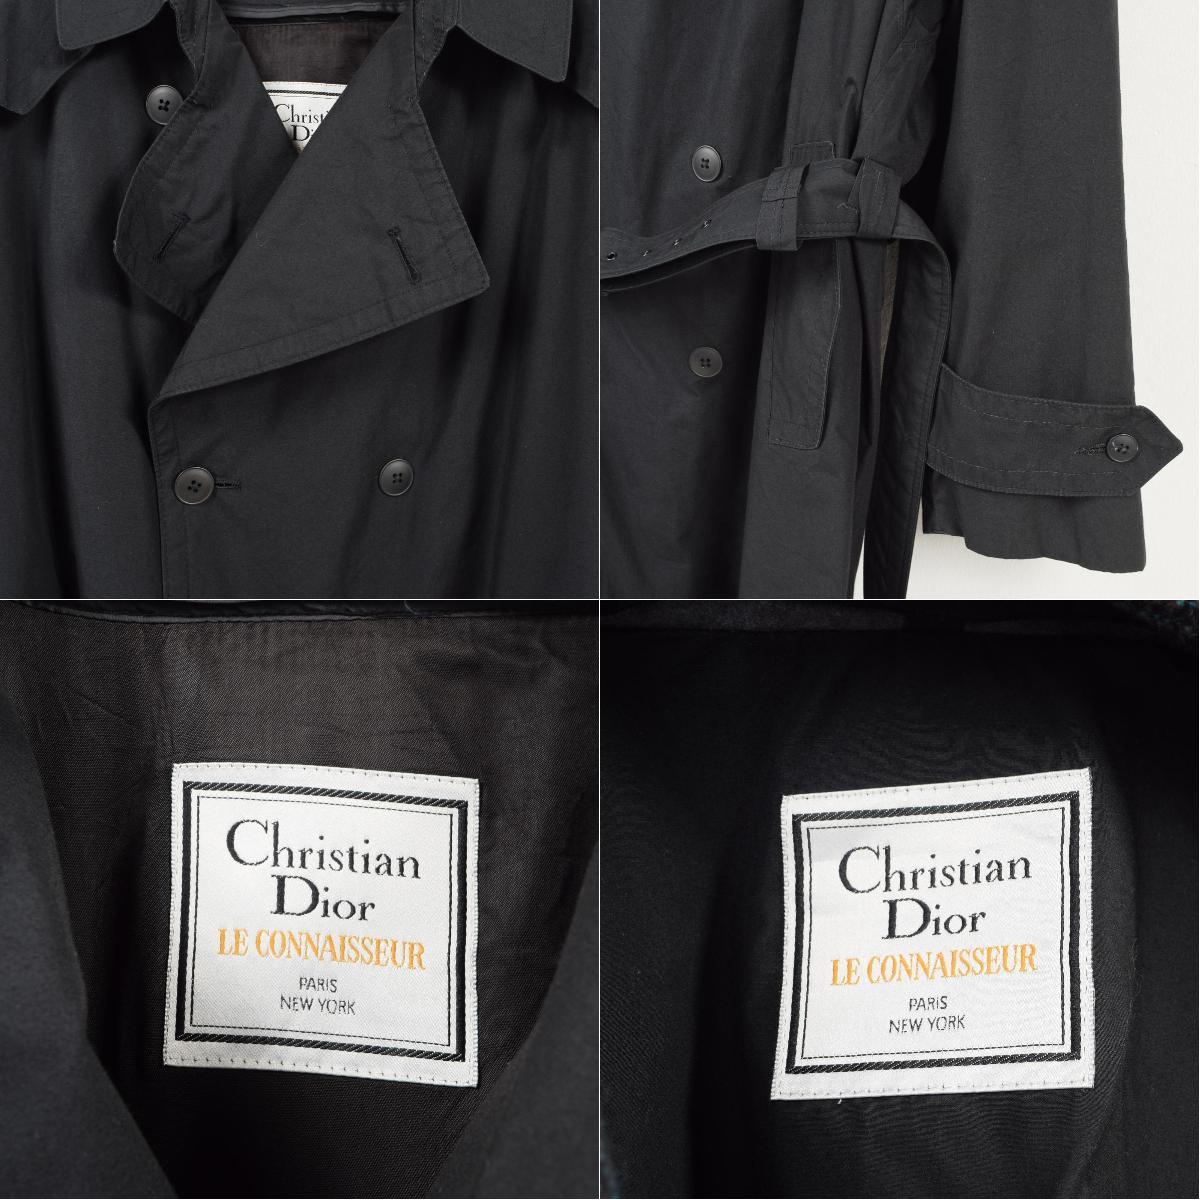 sale retailer 019dc 49614 クリスチャンディオール Christian Dior LE CONNAISSEUR ライナー付き トレンチコート 42R メンズL /wat3400  【181106】